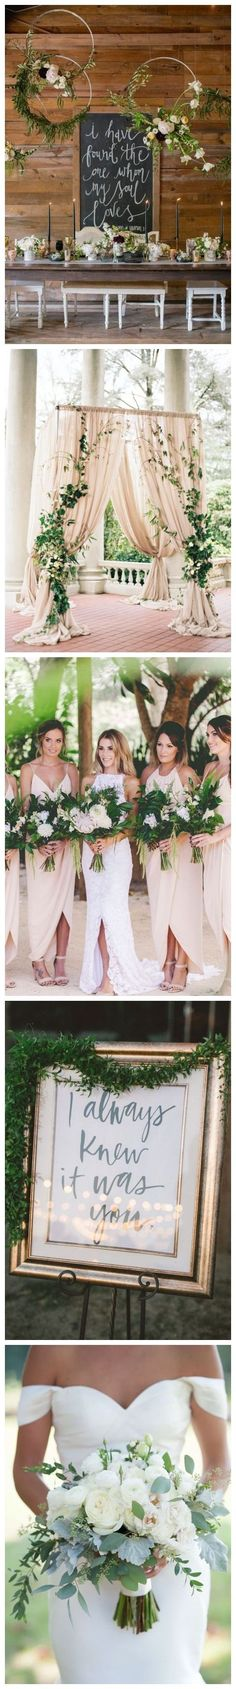 Greenery Wedding Color ideas